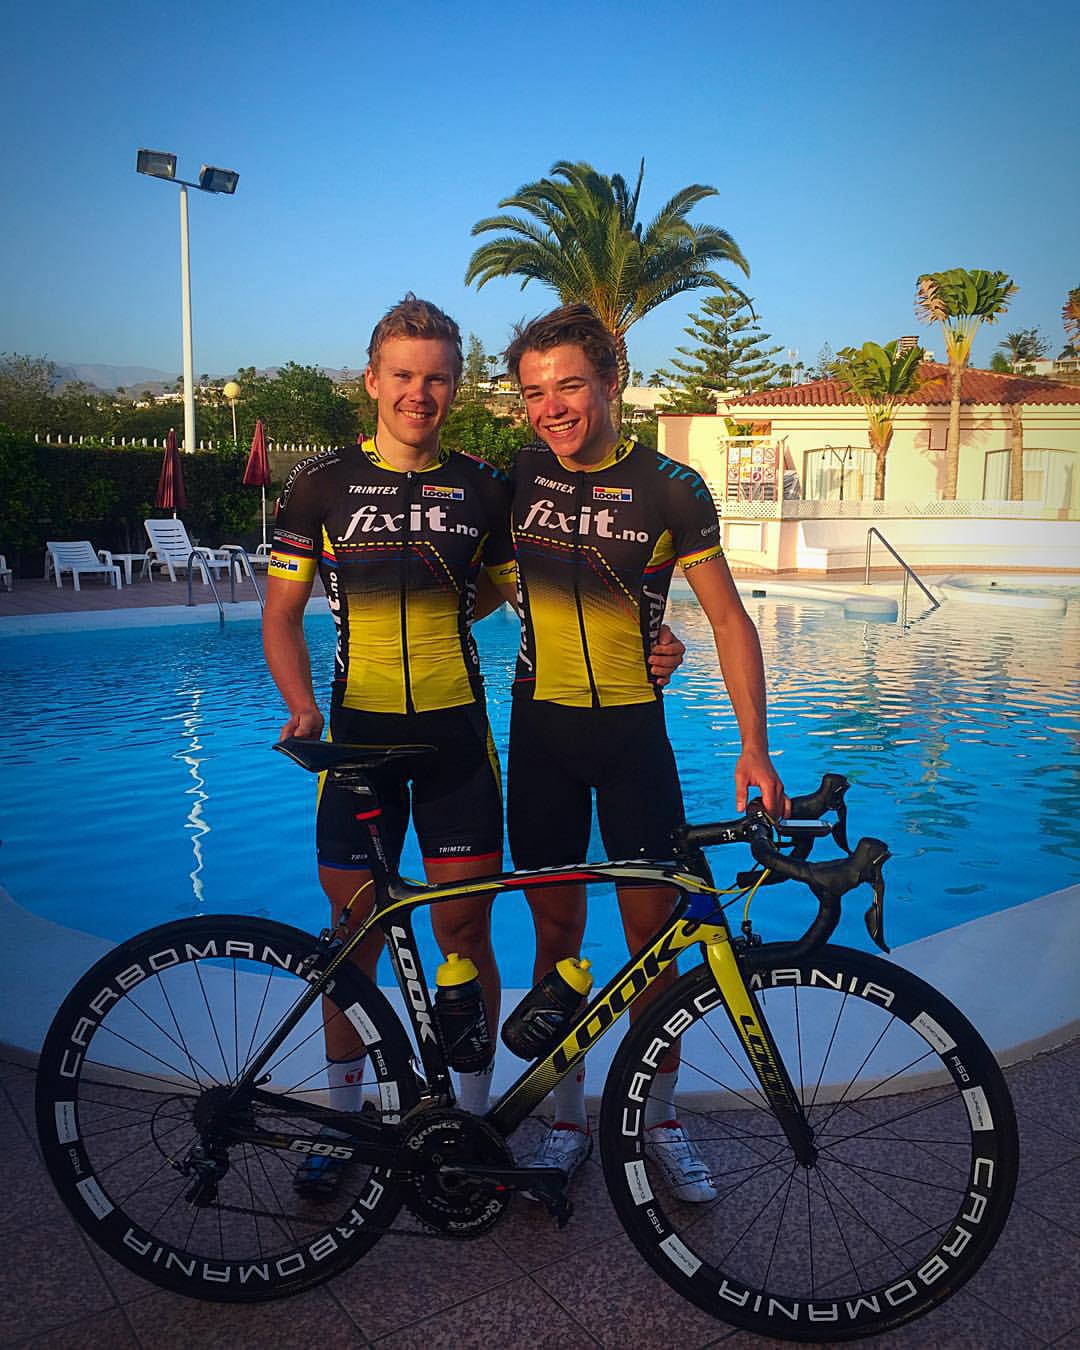 Lagkompiser: Ken-Levi Eikeland og Anders S. Jacobsen. Foto: Team FixIT.no